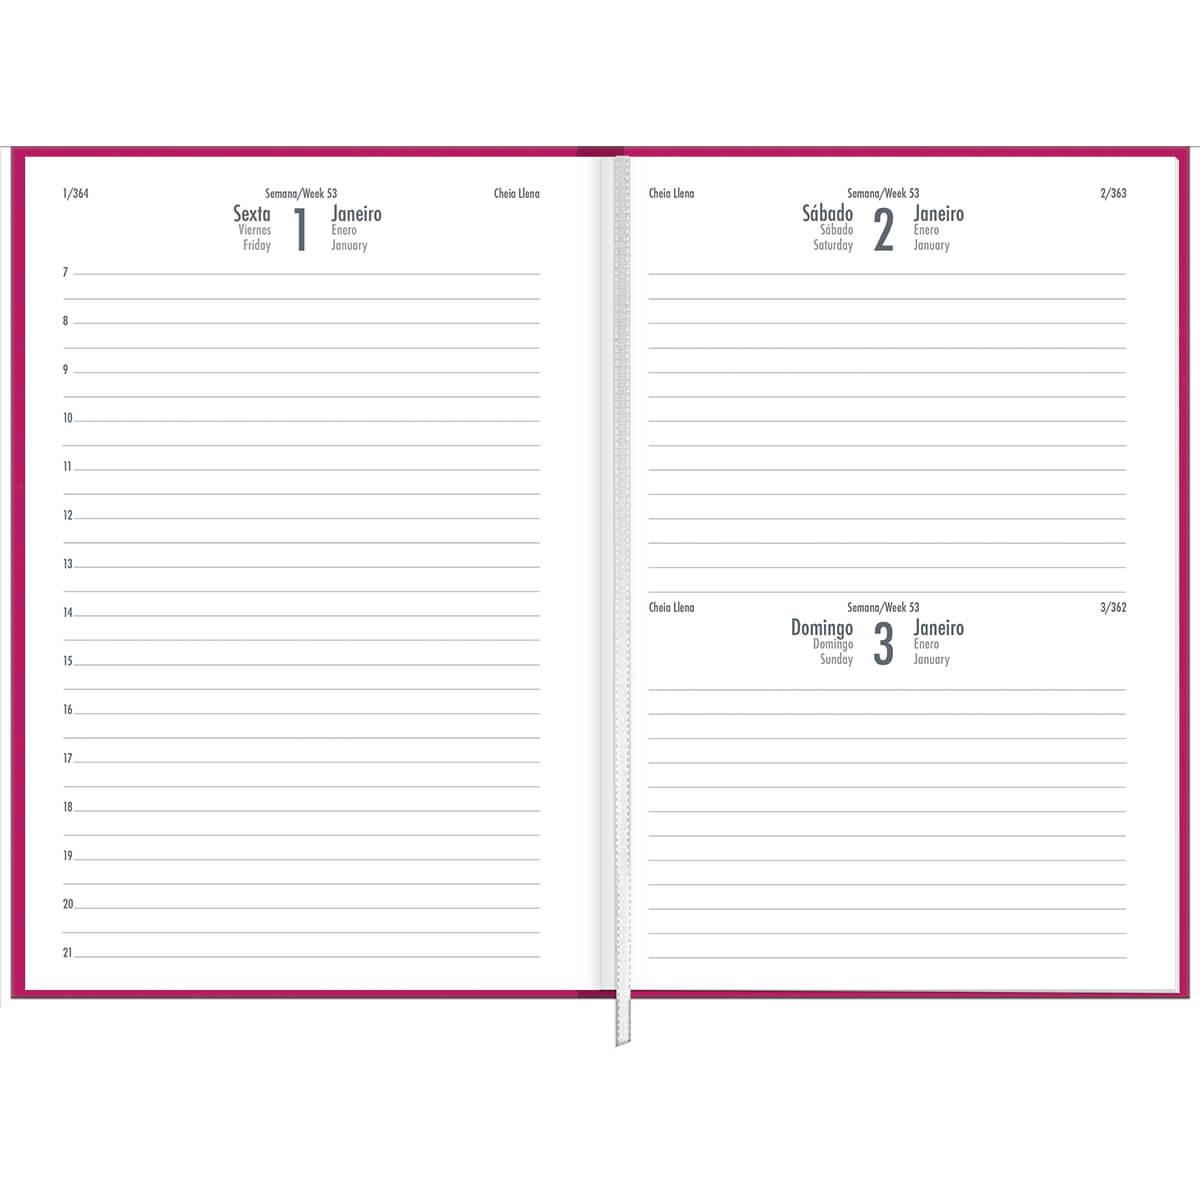 Agenda 2021 costurado 176 fls rosa Napoli M5 Tilibra